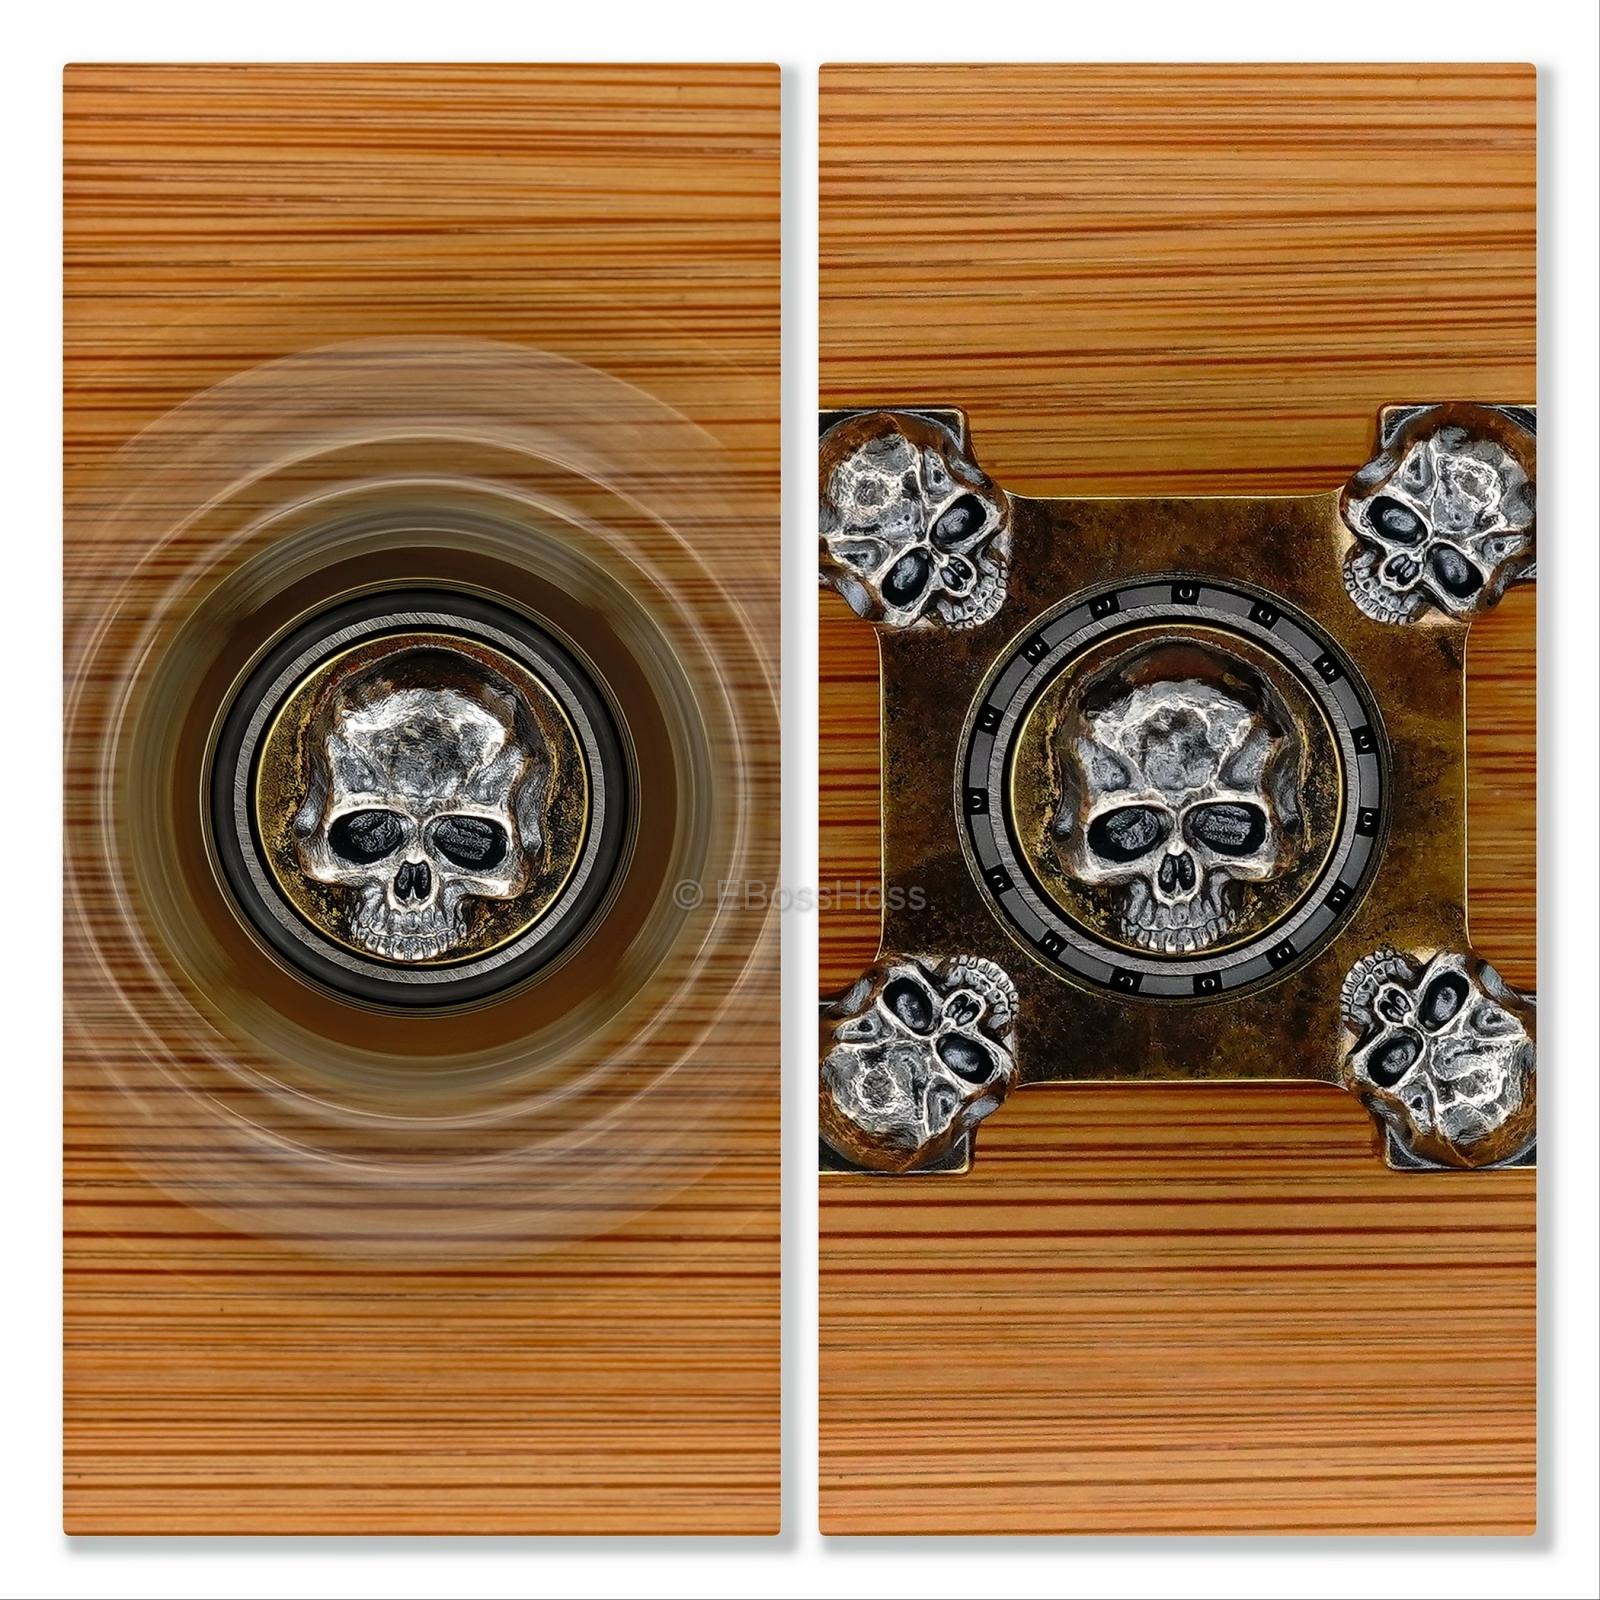 Steel Flame 3-D Sterling Silver Large Warrior Skulls Ring Spin KillBoX